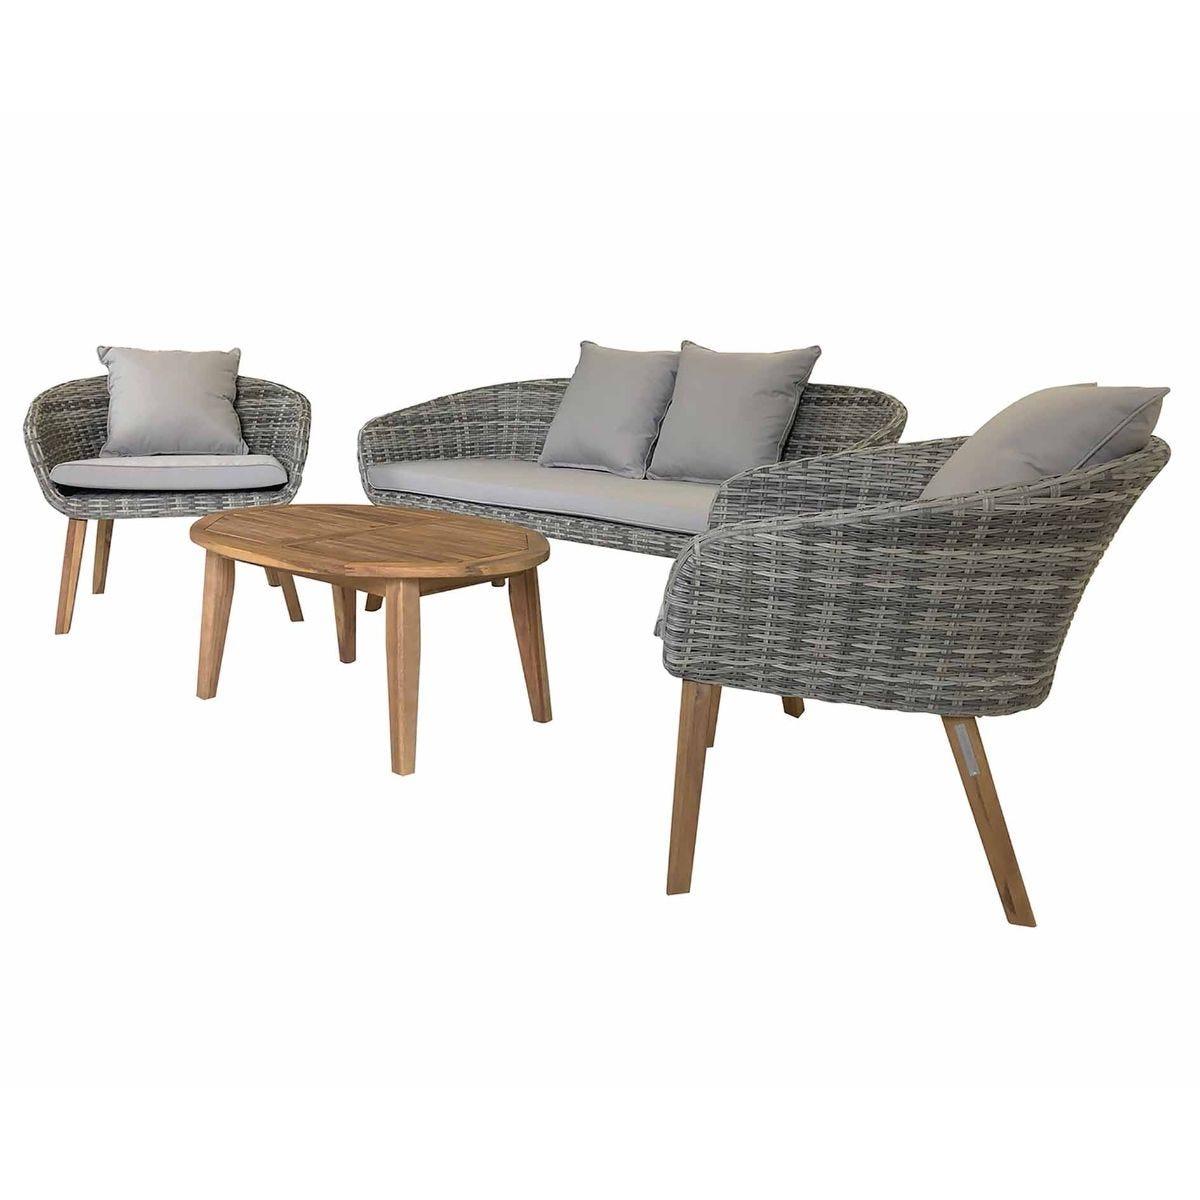 Charles Bentley Madrid Rattan Garden Lounge Set, Grey